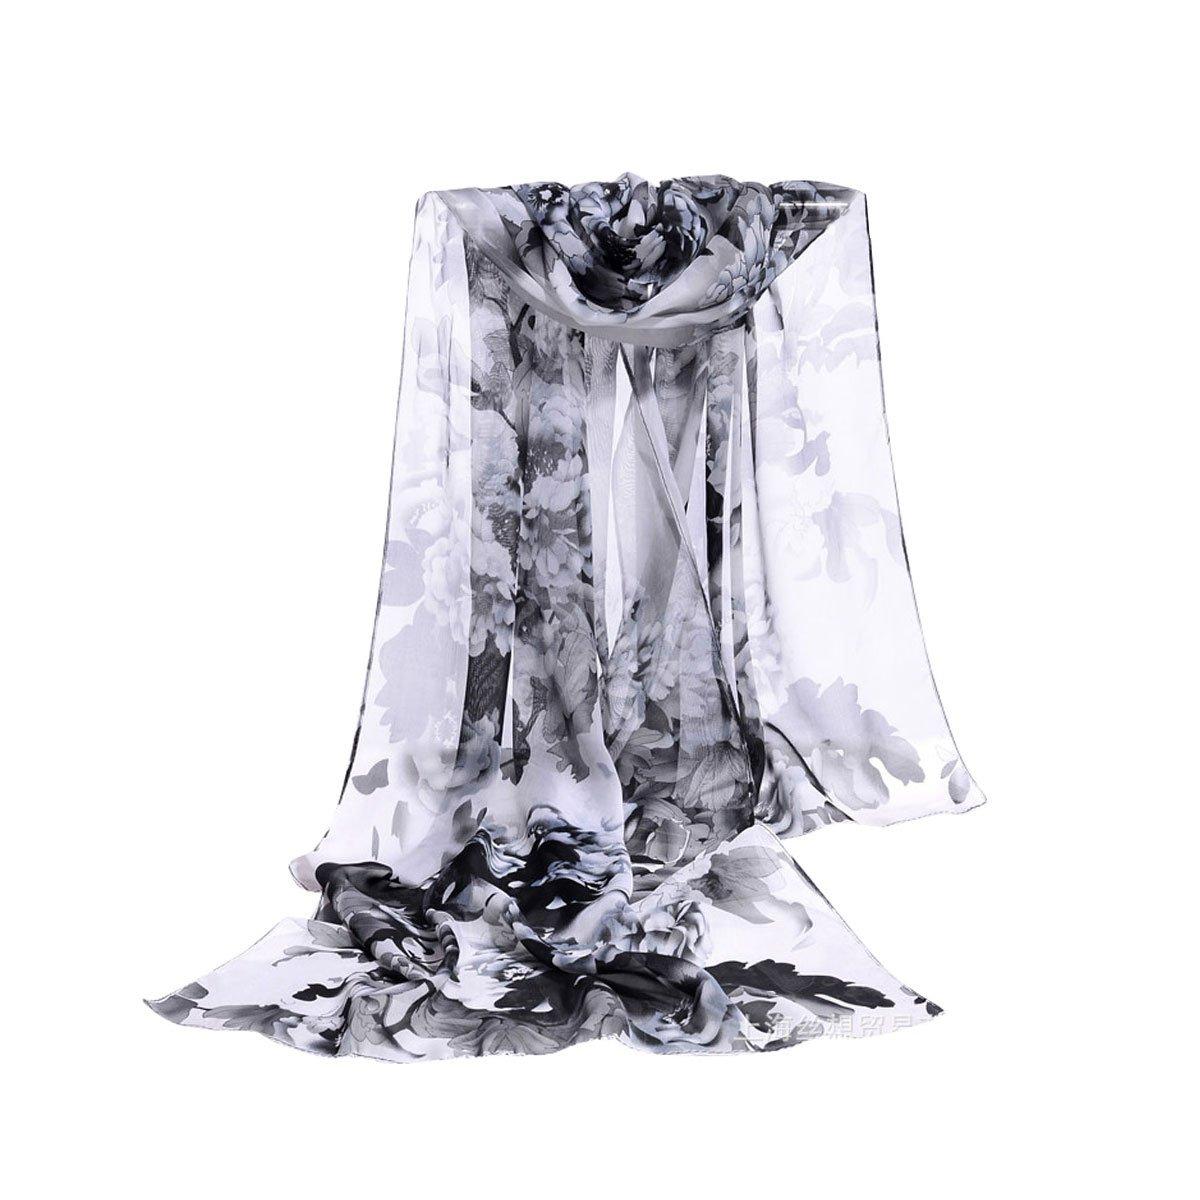 E-Clover Women Soft Floral Print Shawl Chiffon Sheer Scarf (Black&white)